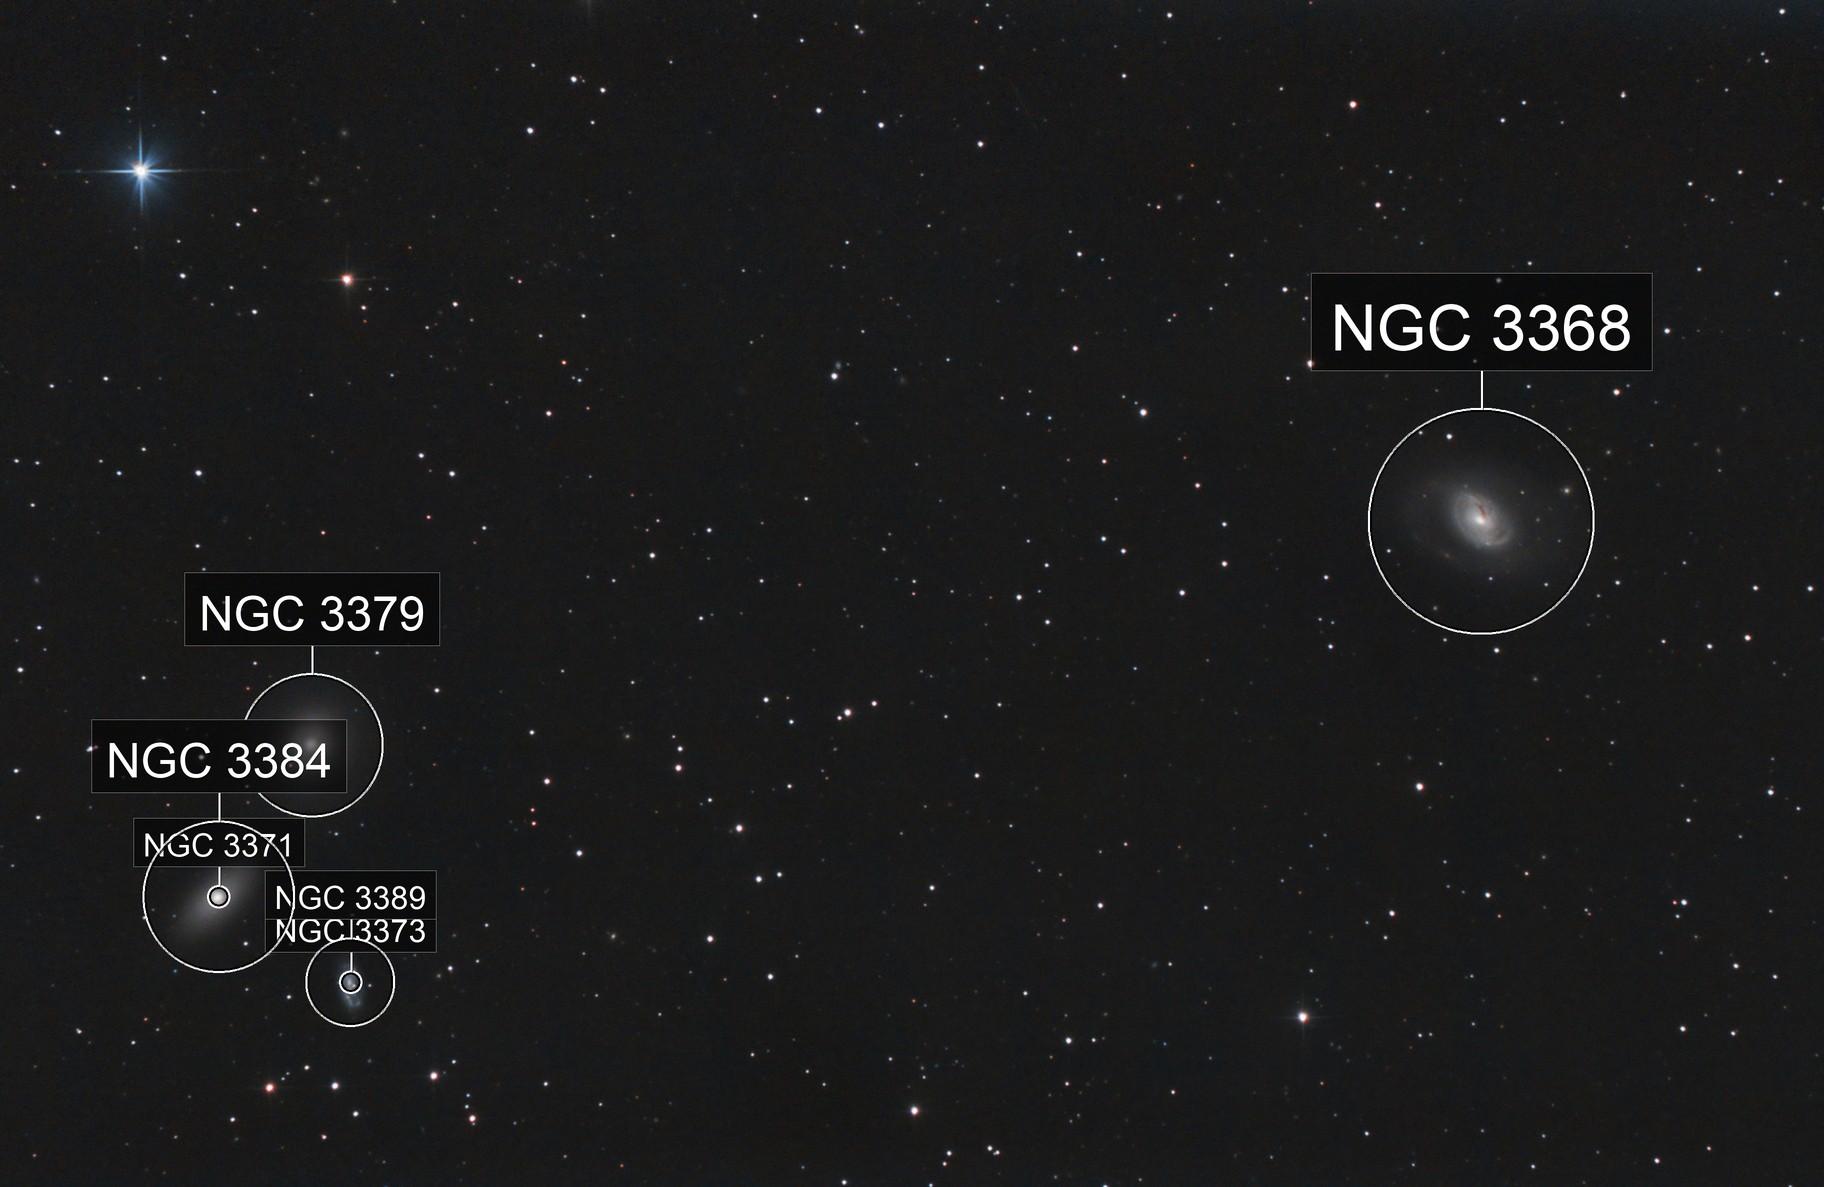 M96 Local Group and 5565 Ukyounodaibu asteroid